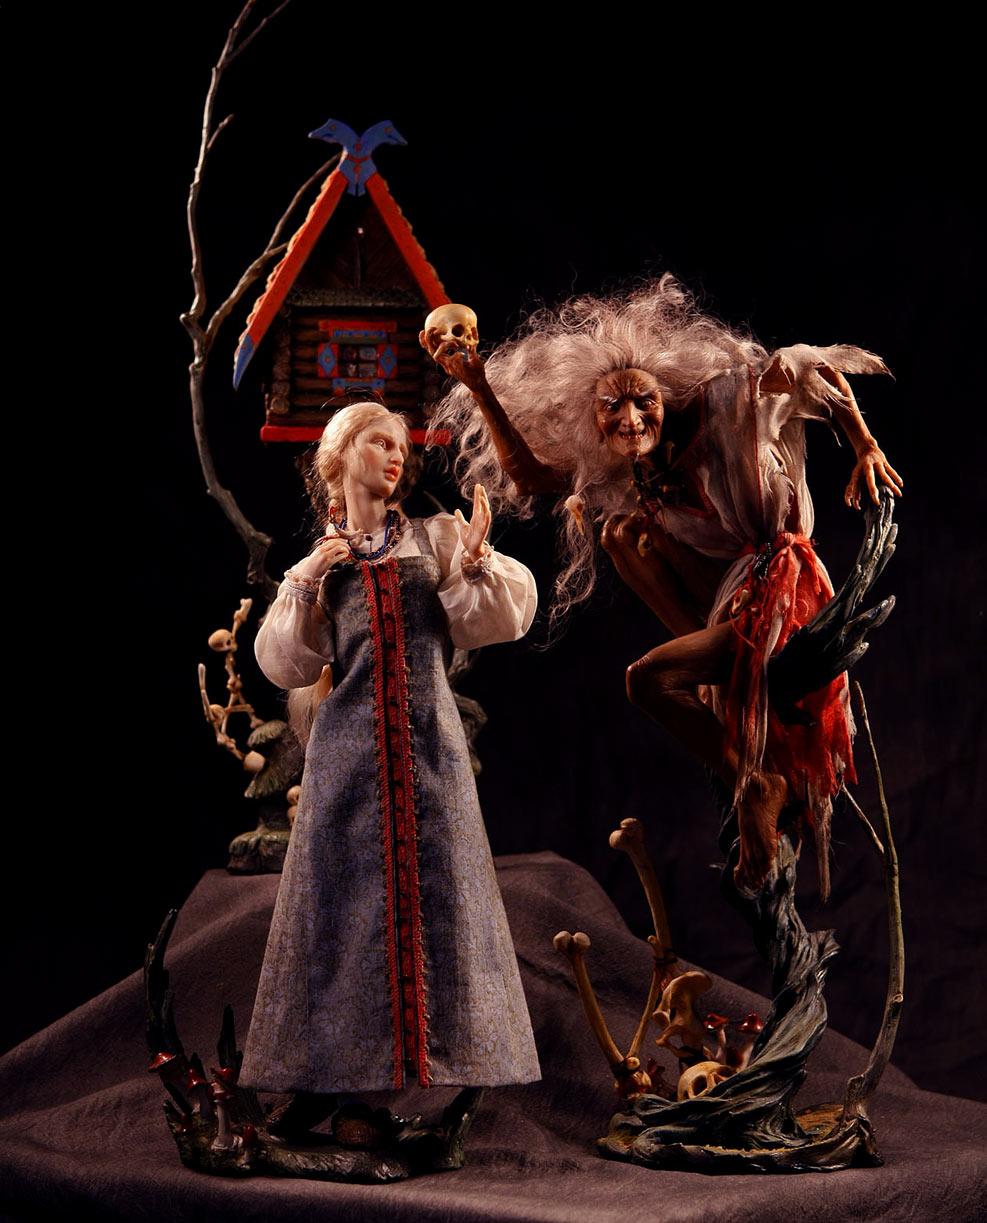 Baba Yaga and Vasilisa, with Hut. Dolls in Kato Polyclay